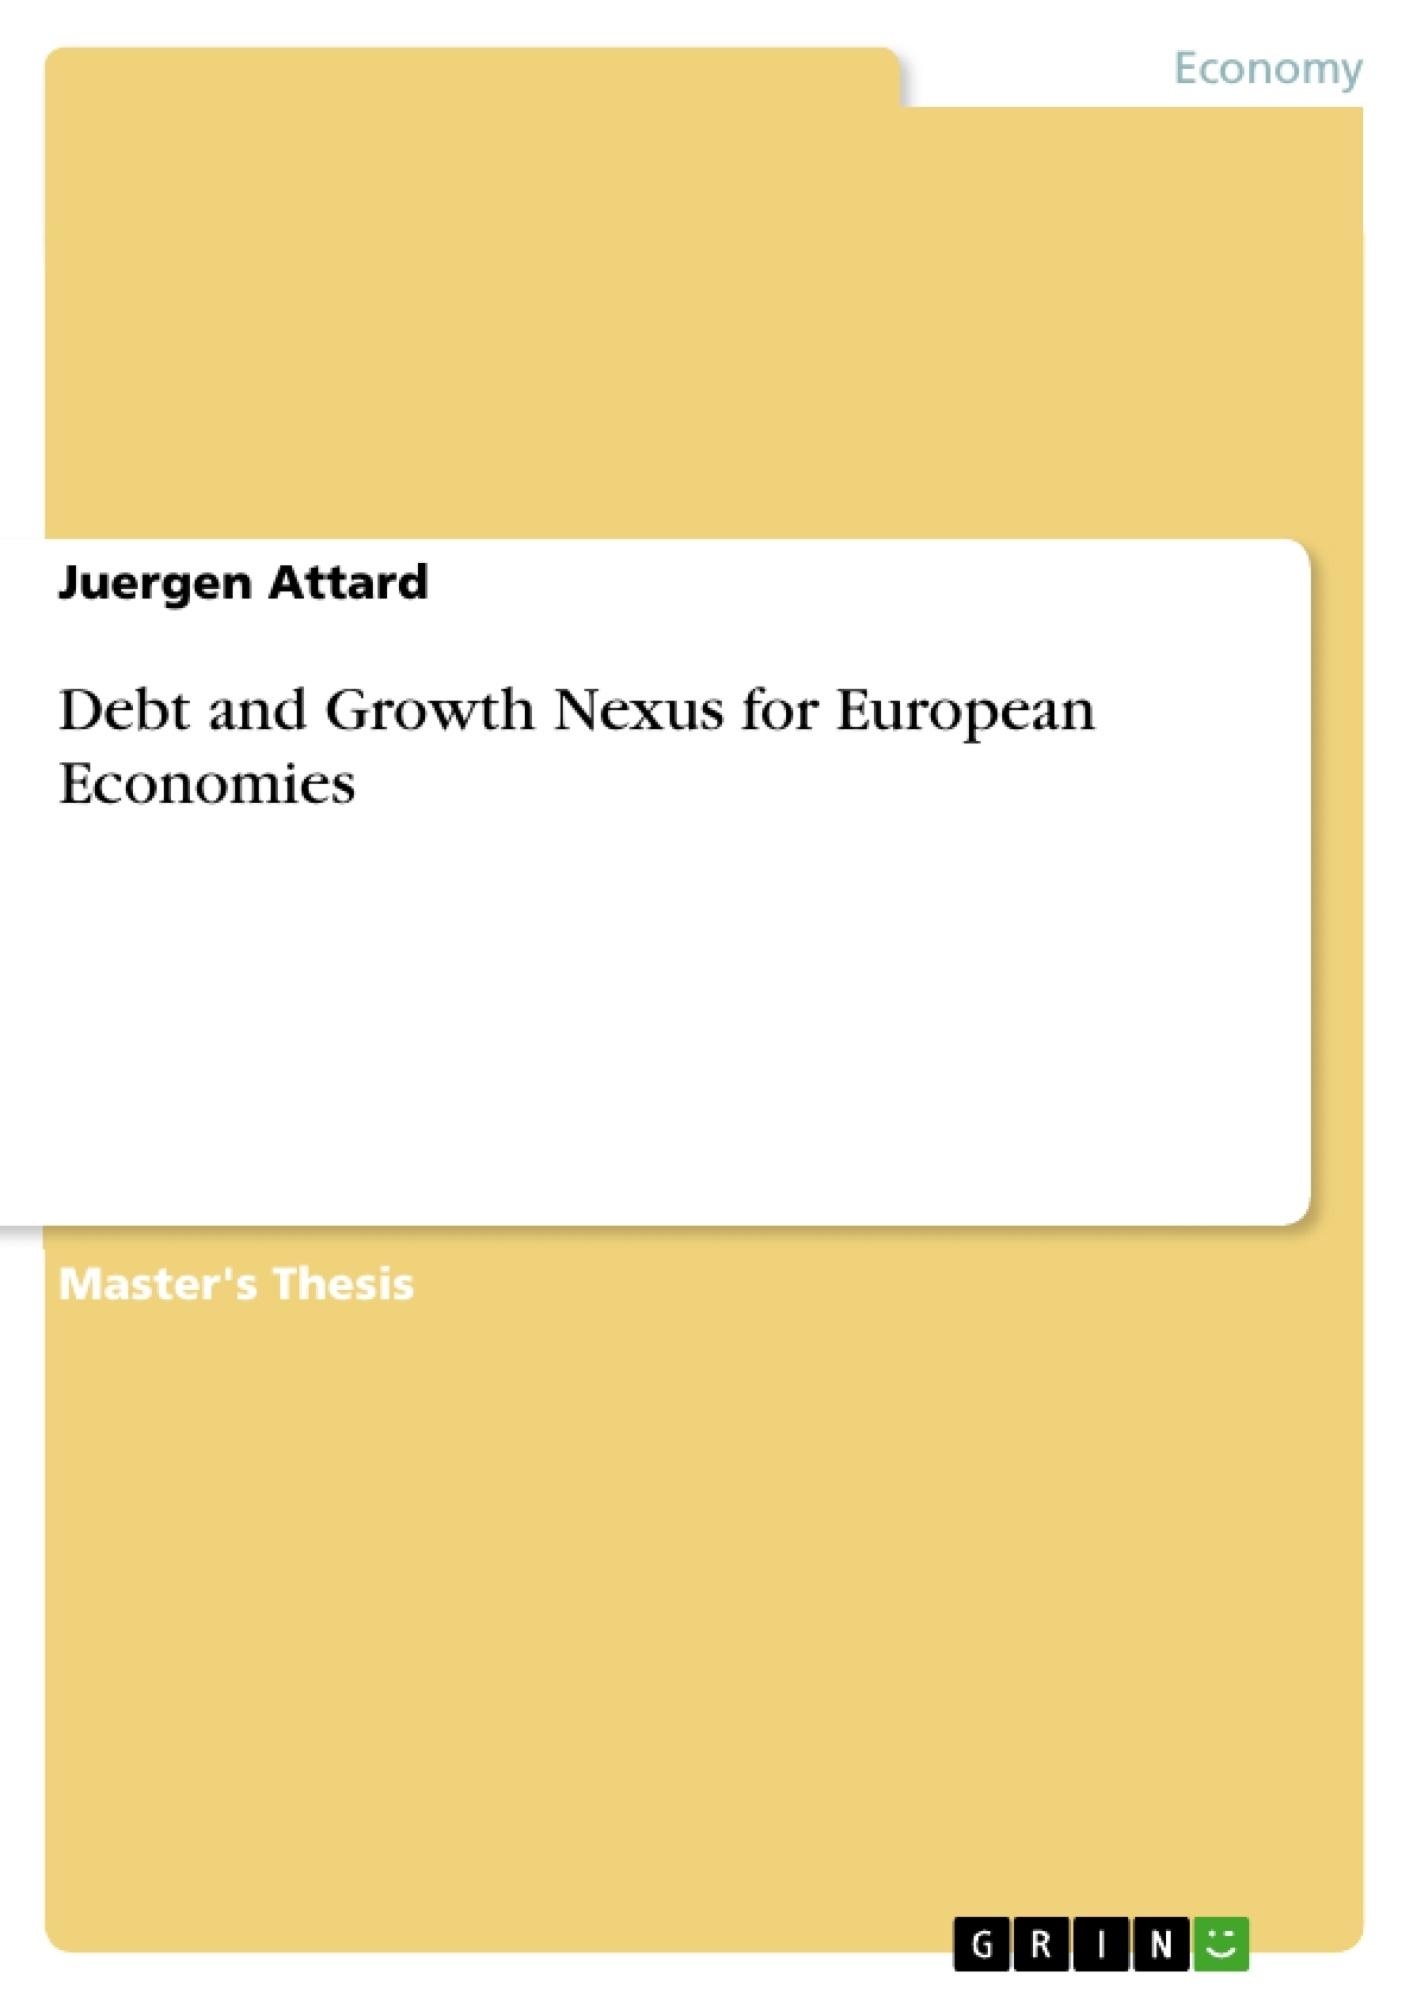 Title: Debt and Growth Nexus for European Economies